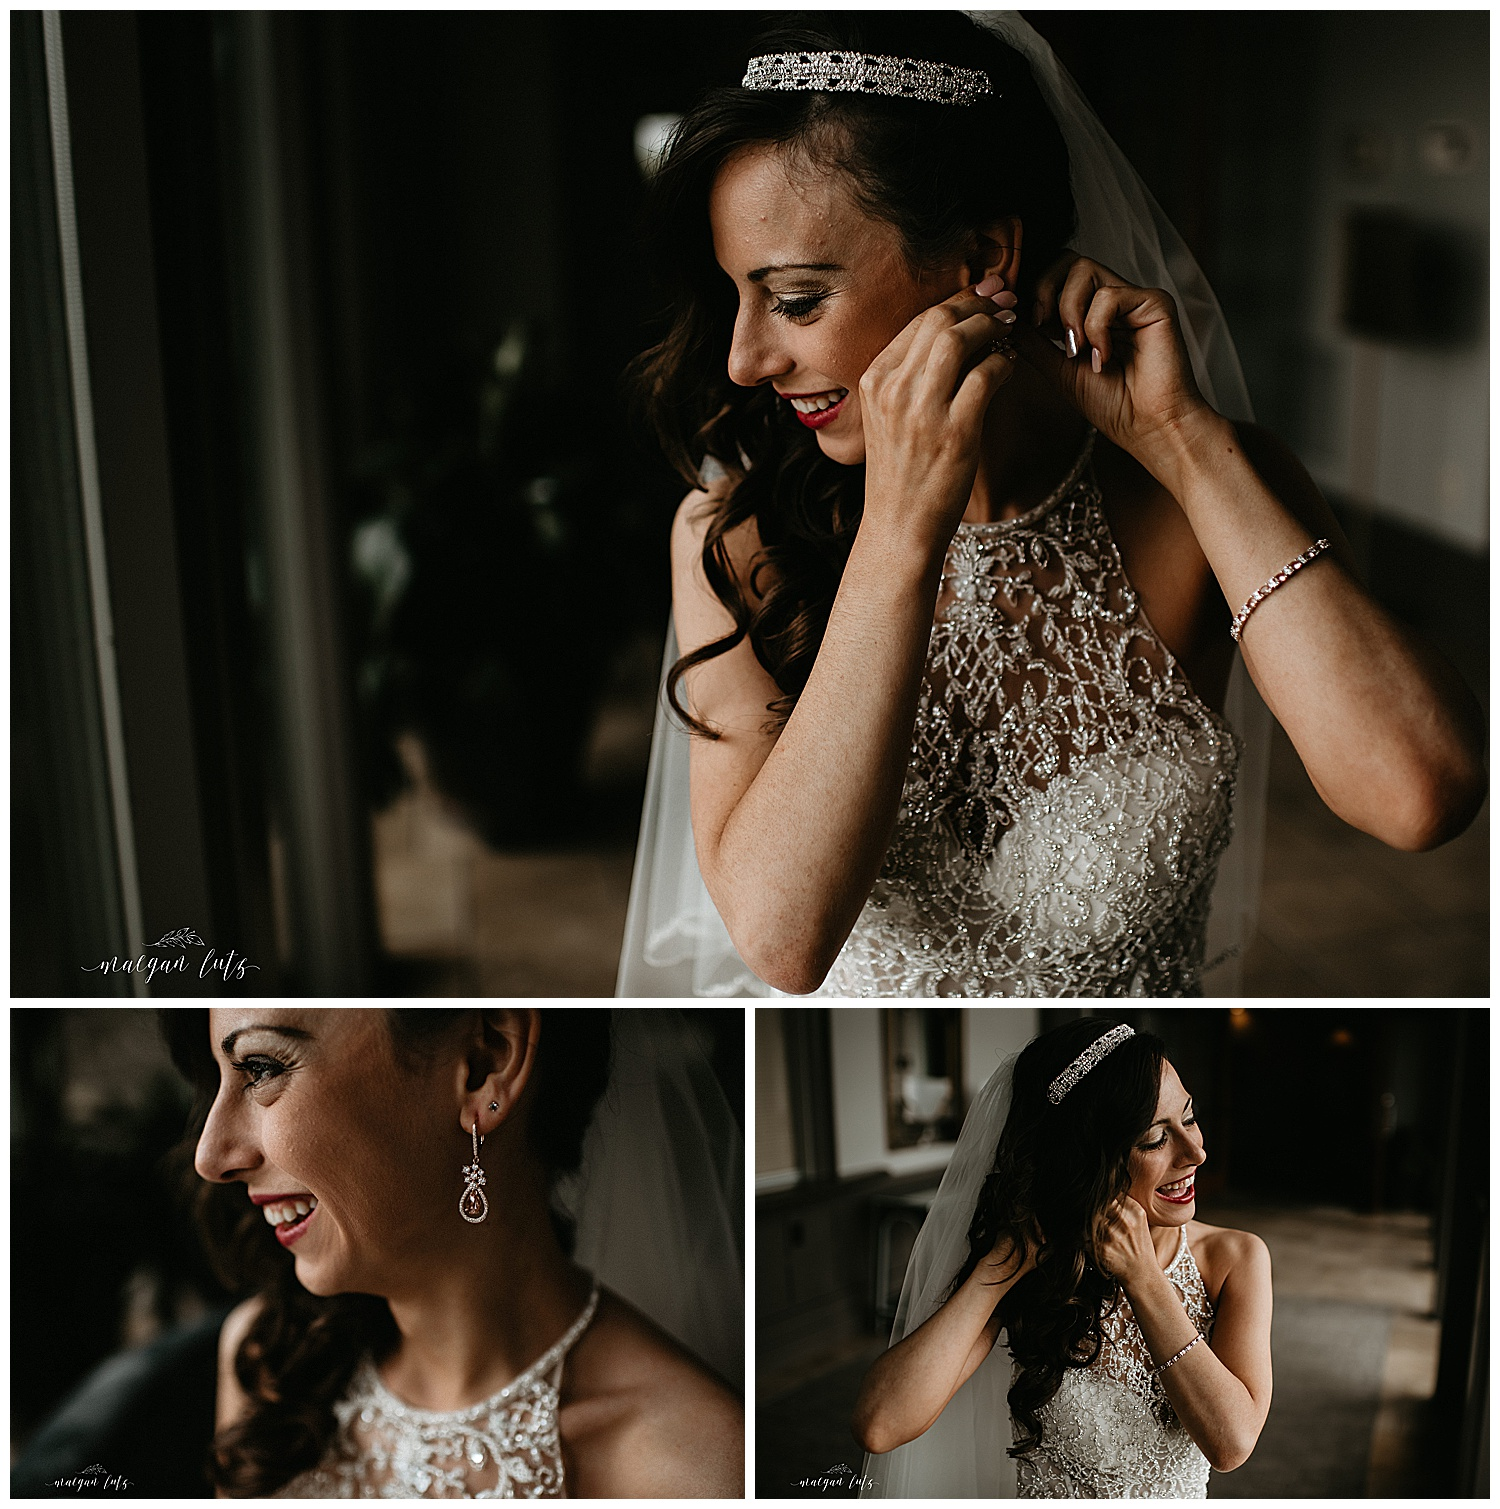 NEPA-Lehigh-Valley-Wedding-Photographer-at-Glen-Oak-Country-Club-Clarks-Summit-PA_0011.jpg